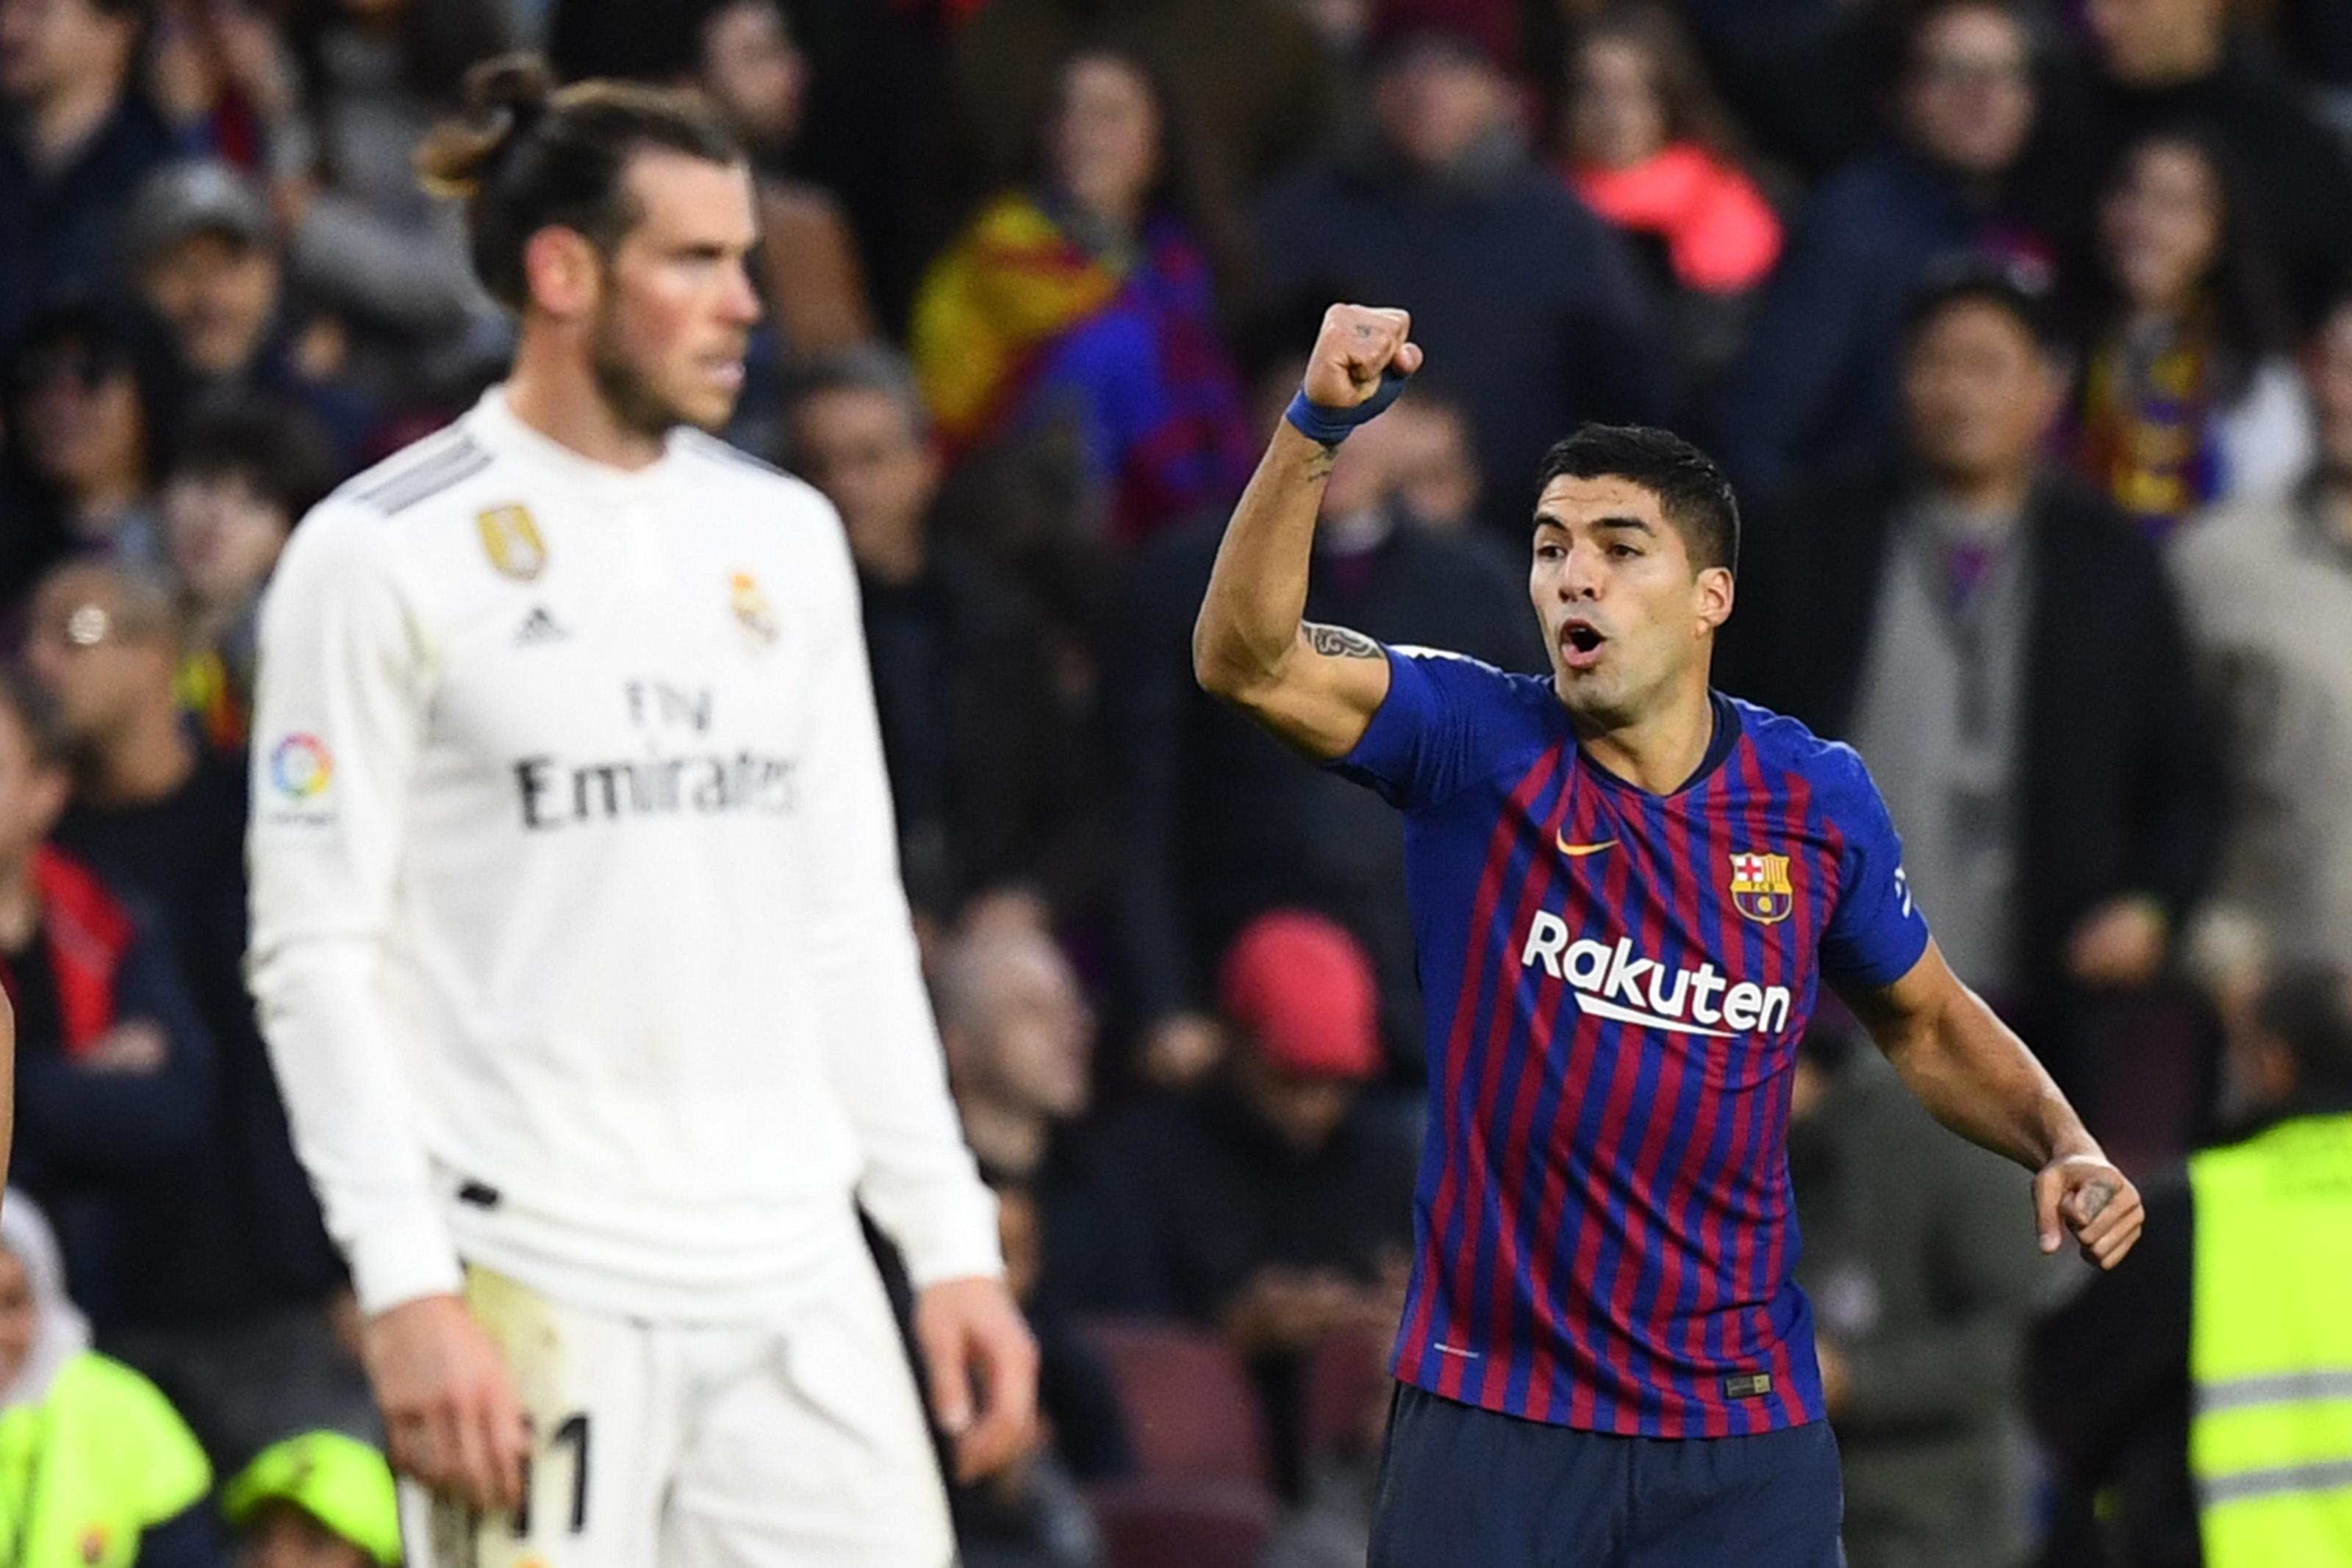 A Barcelona 5-1-re verte a Realt